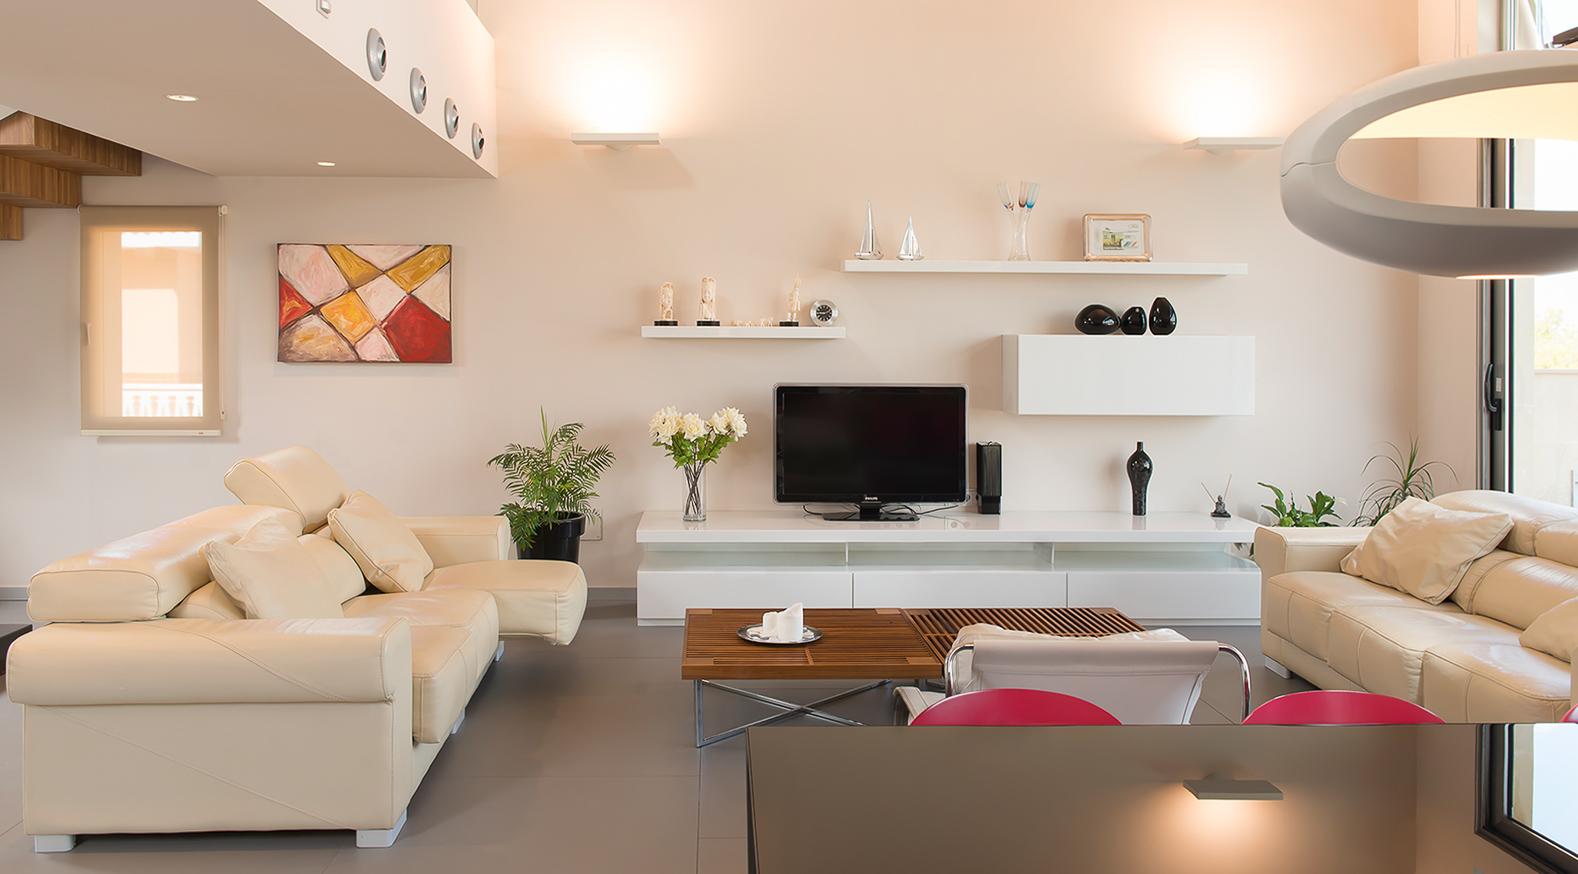 Designer Home In Torrevieja Luxury Property For Sale Torrevieja  # Muebles Torrevieja Spain